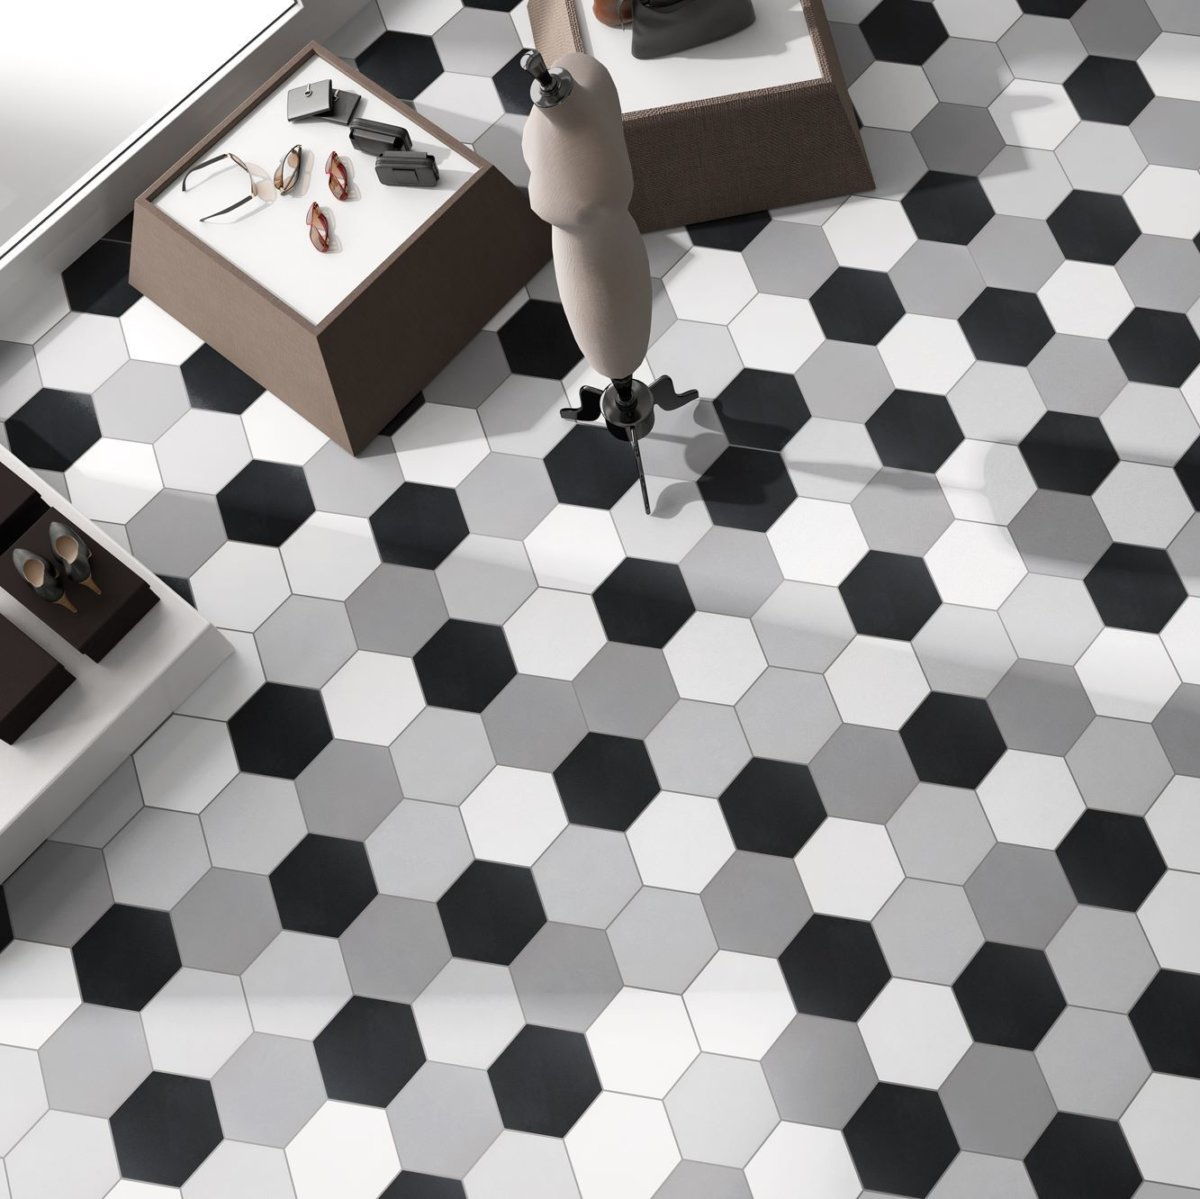 Codicer Hexagon Basic White Porcelain 220x250mm_Stiles_Lifestyle_Image